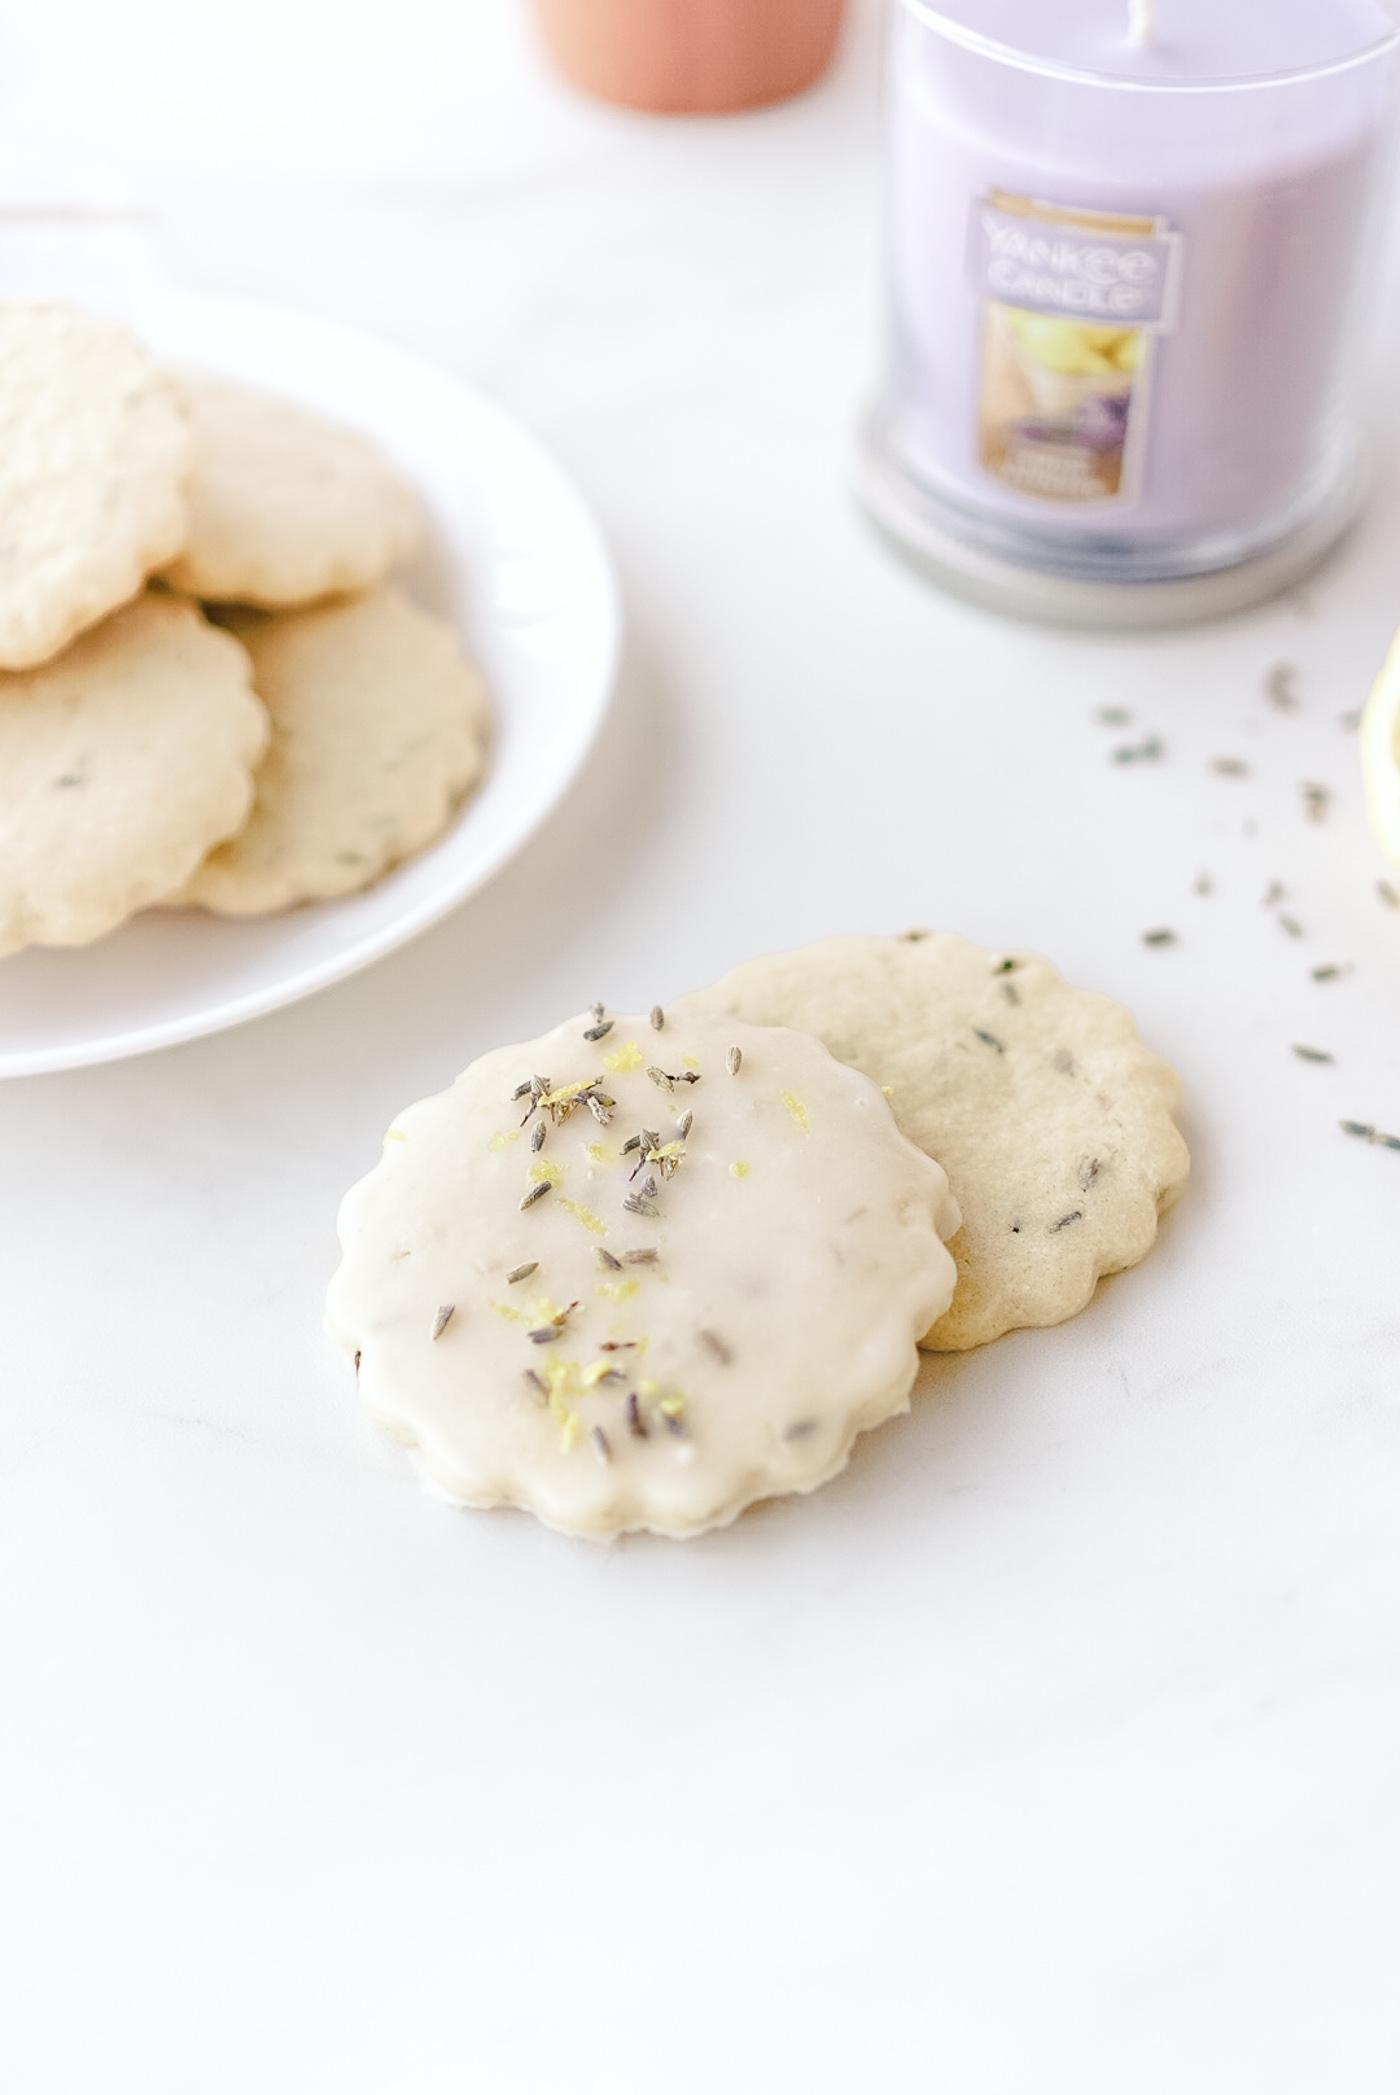 lemon lavender glazed cookies on white marble counter